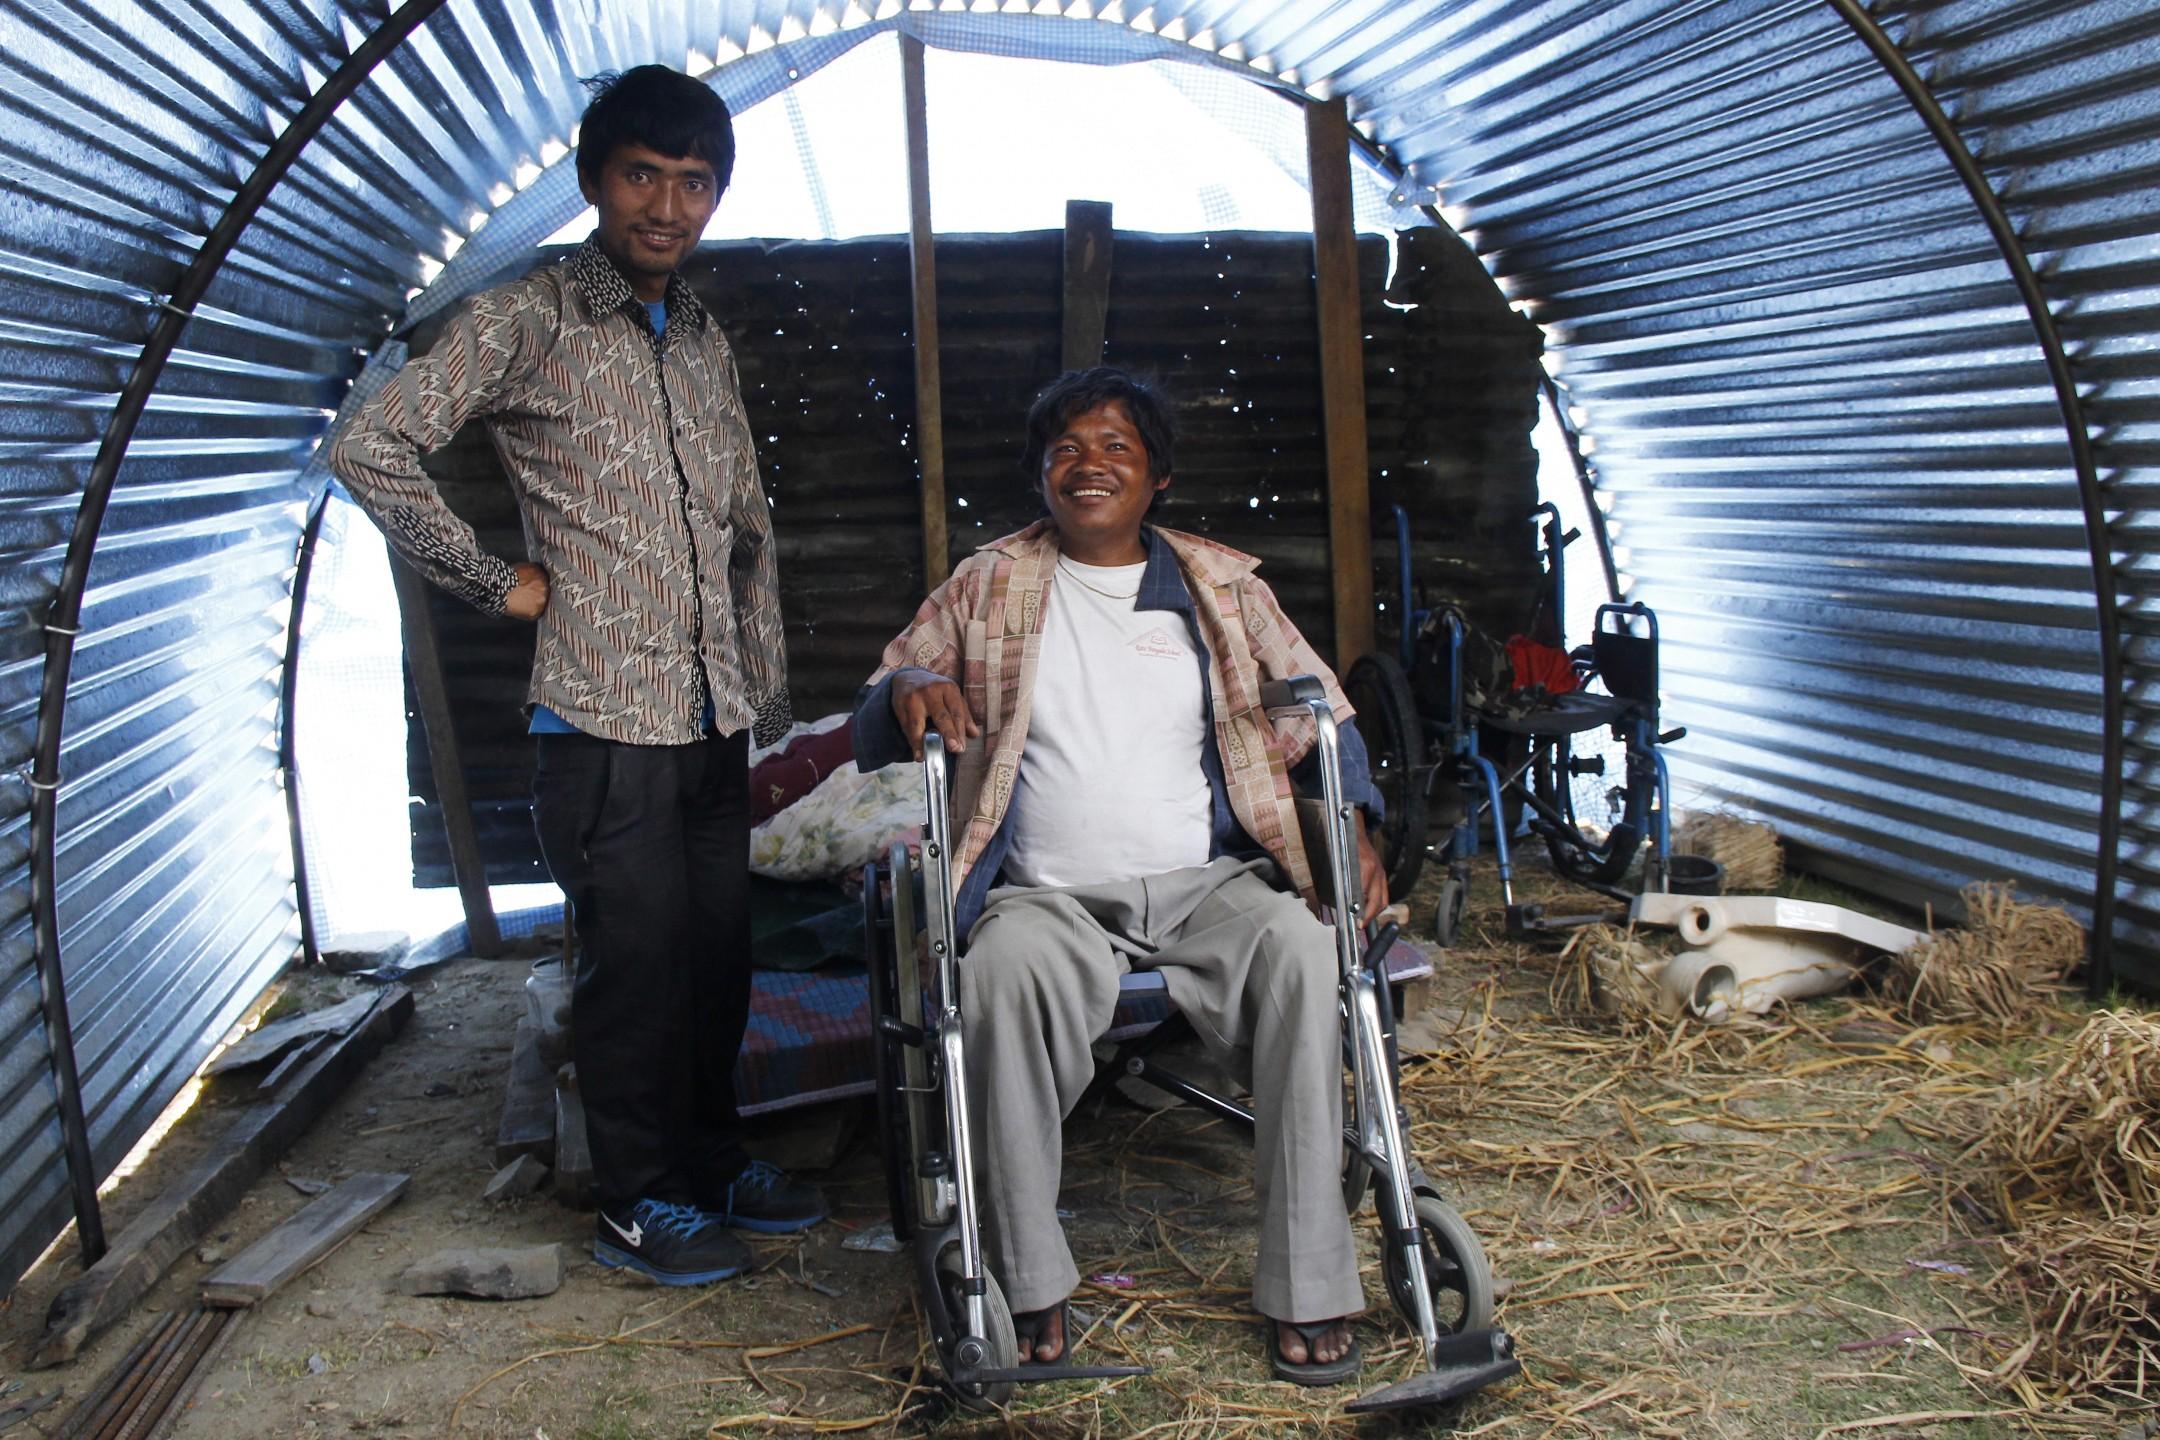 Beeld: Poornima Shrestha (c)